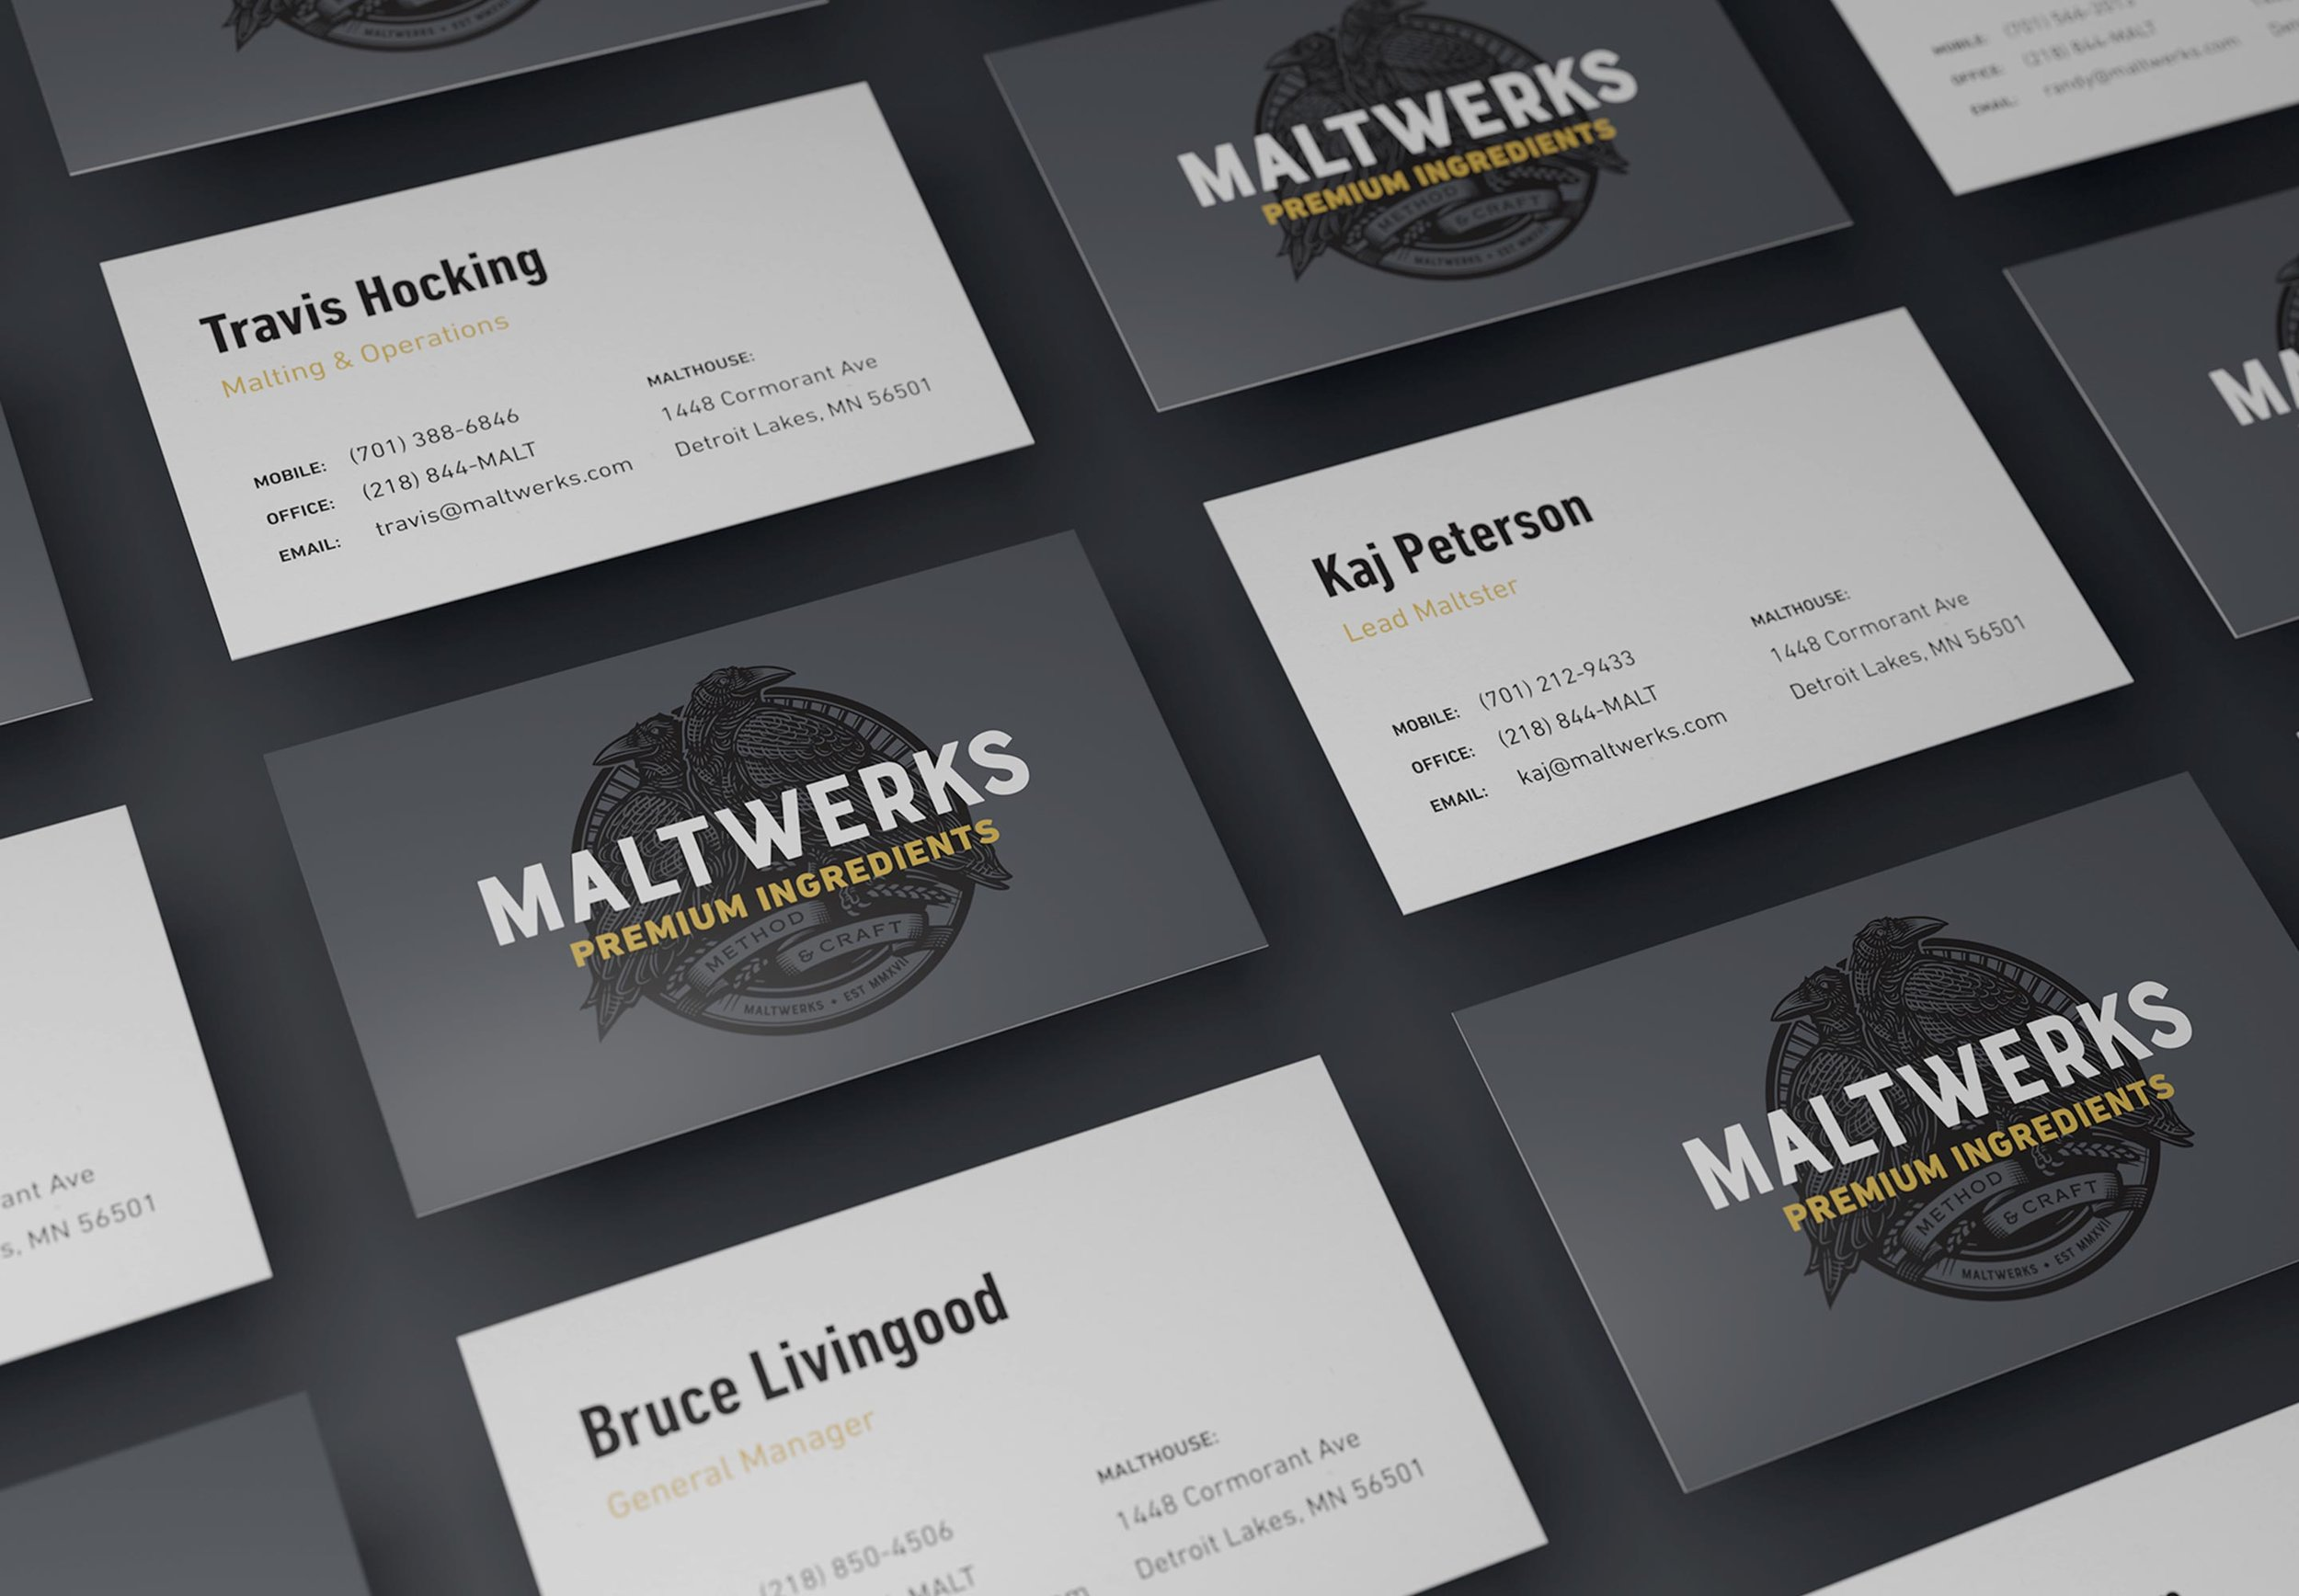 maltwerks-business-cards.jpg